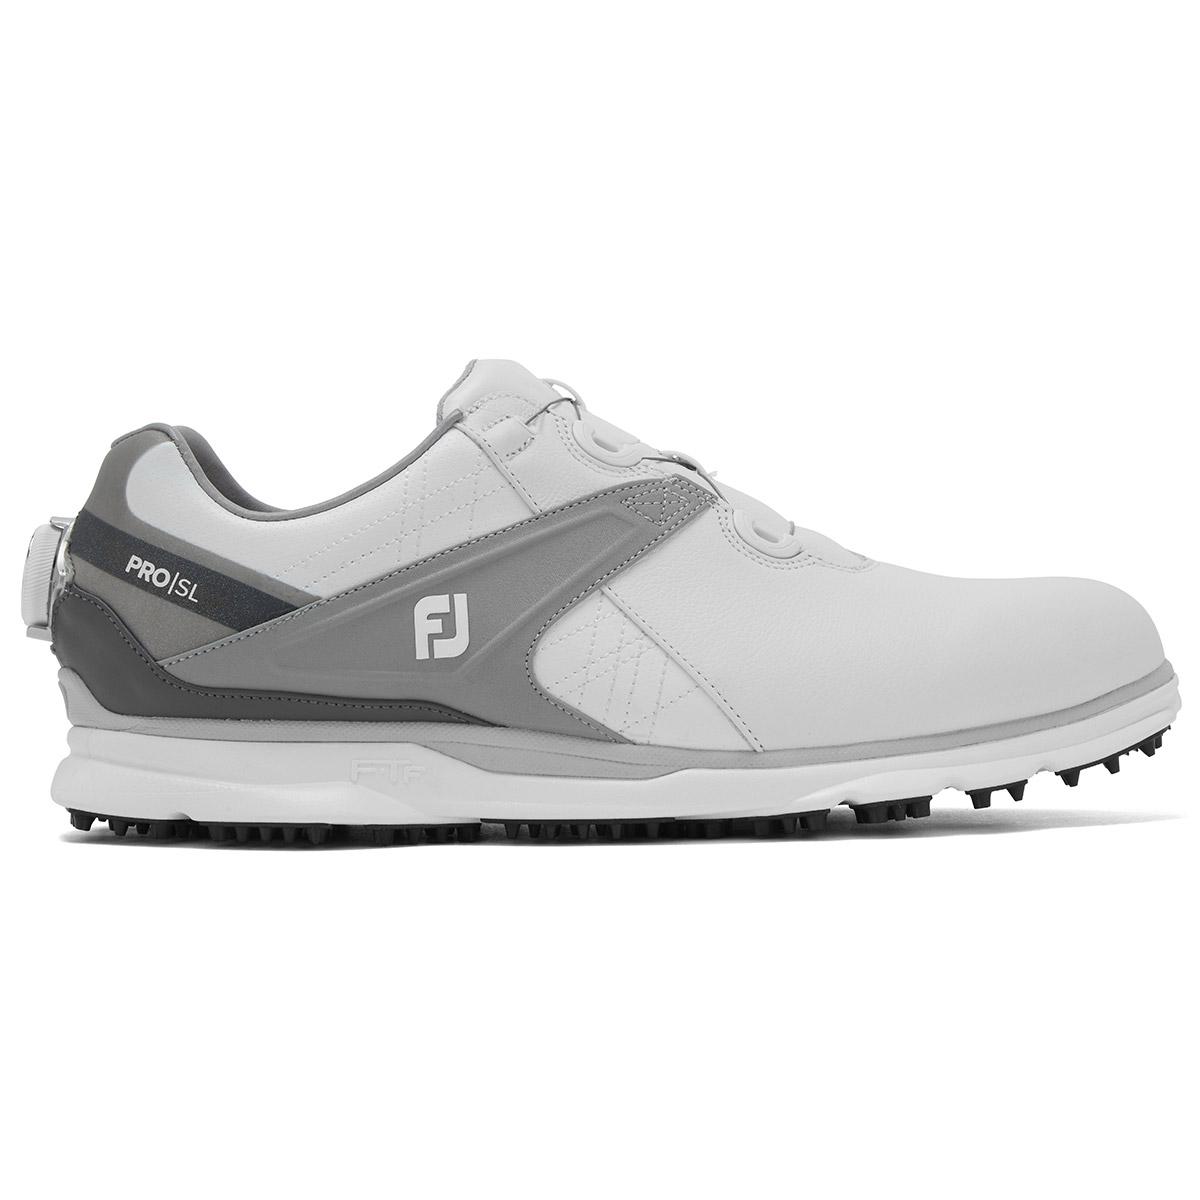 355230-WhiteGrey-FootJoy-Pro-SL-BOA-Shoes-2020-1